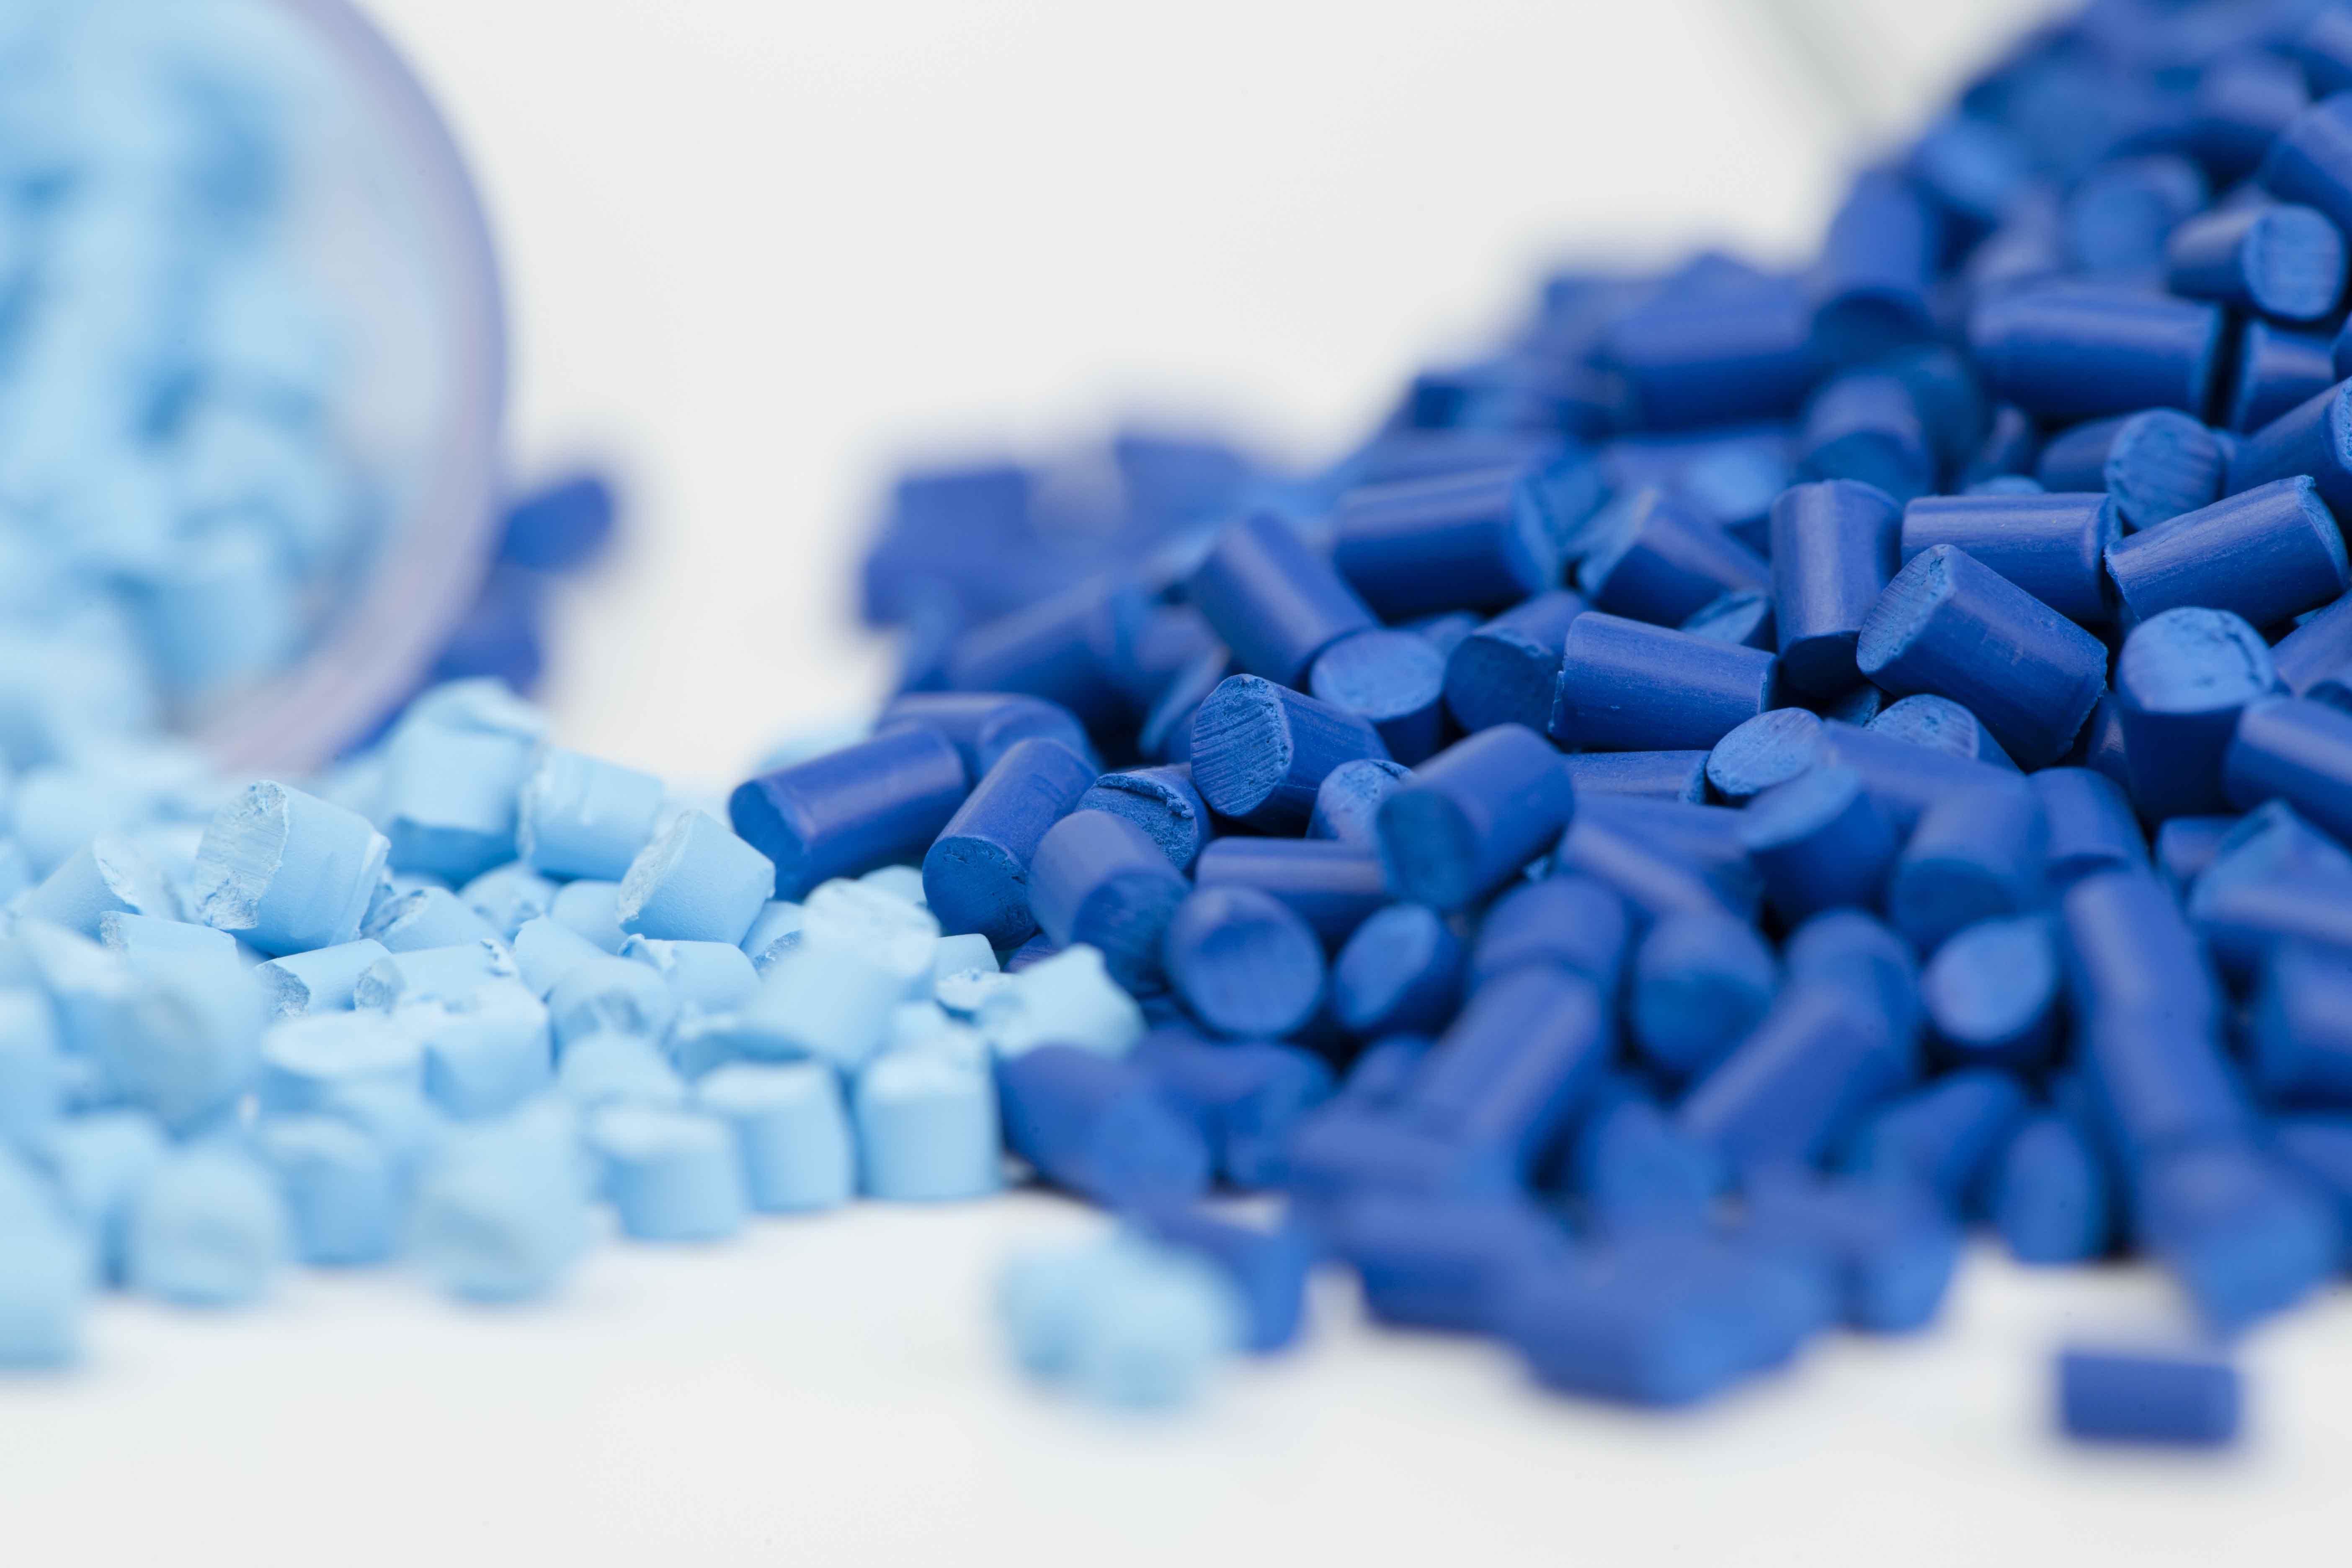 Materials development - plastic granules